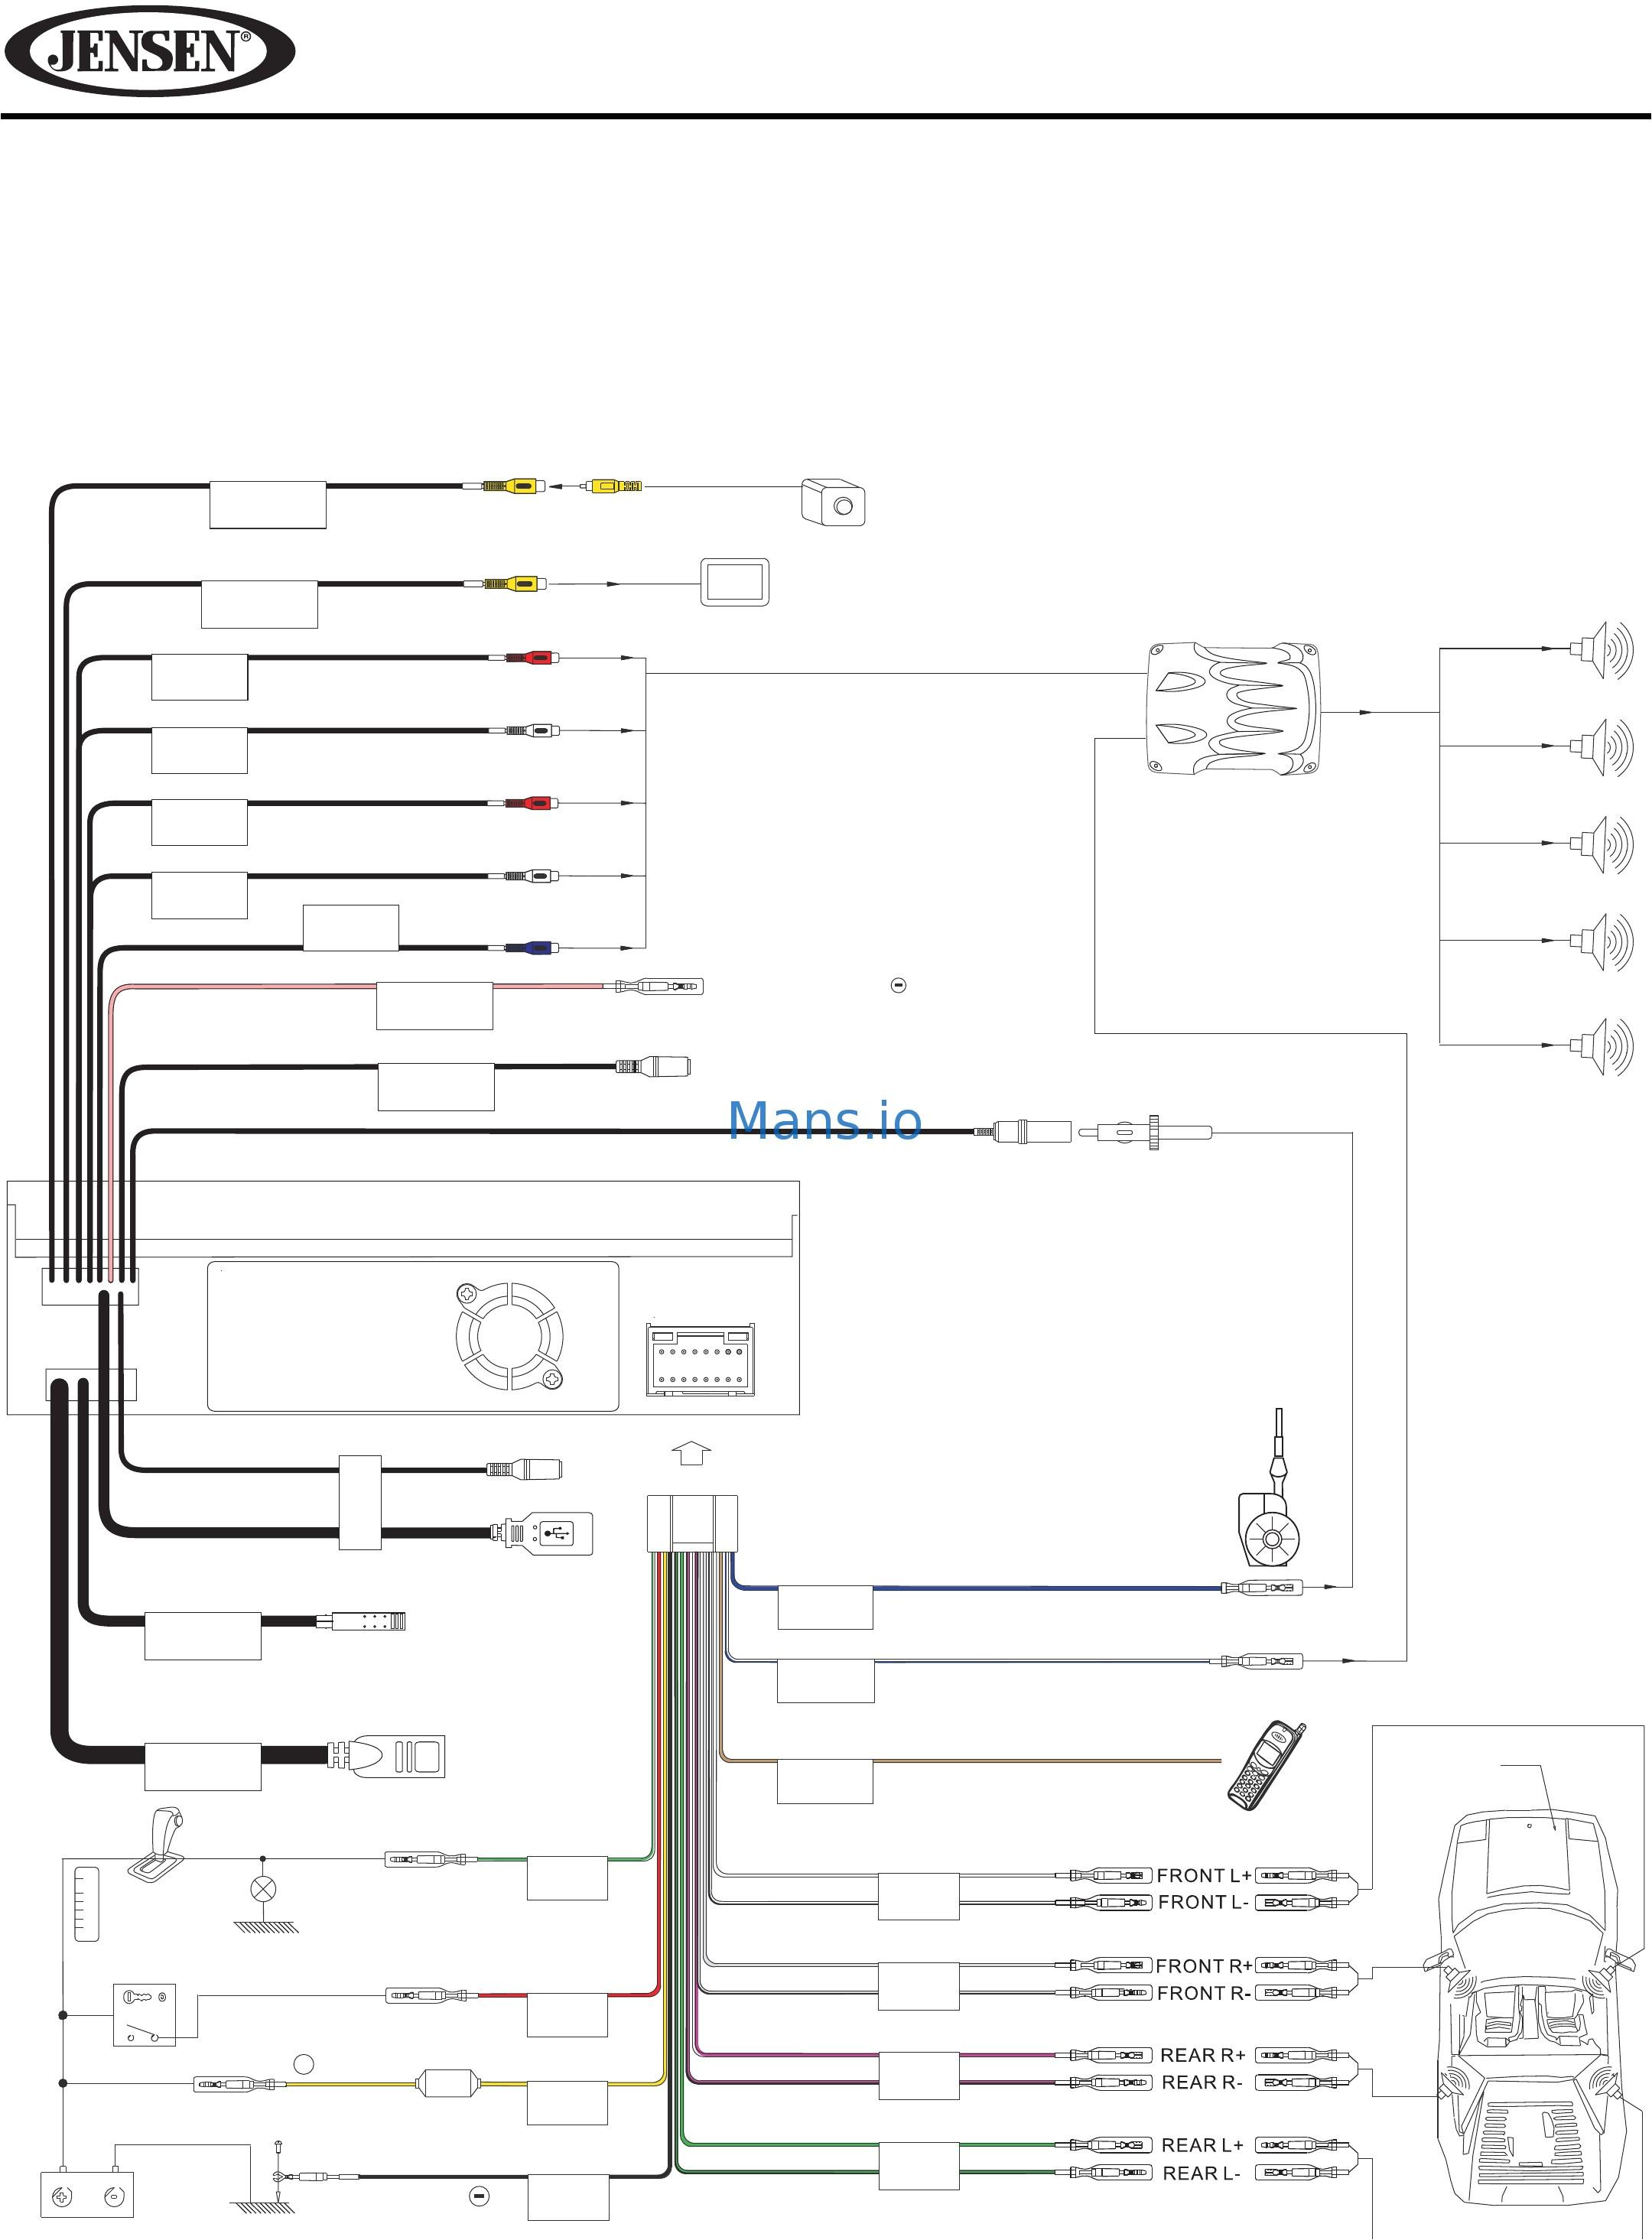 Jensen Phase Linear Uv8 Wiring Diagram Jensenuv10wiringharness Jensen Uv8 Phase Linear Dvd Player Blog